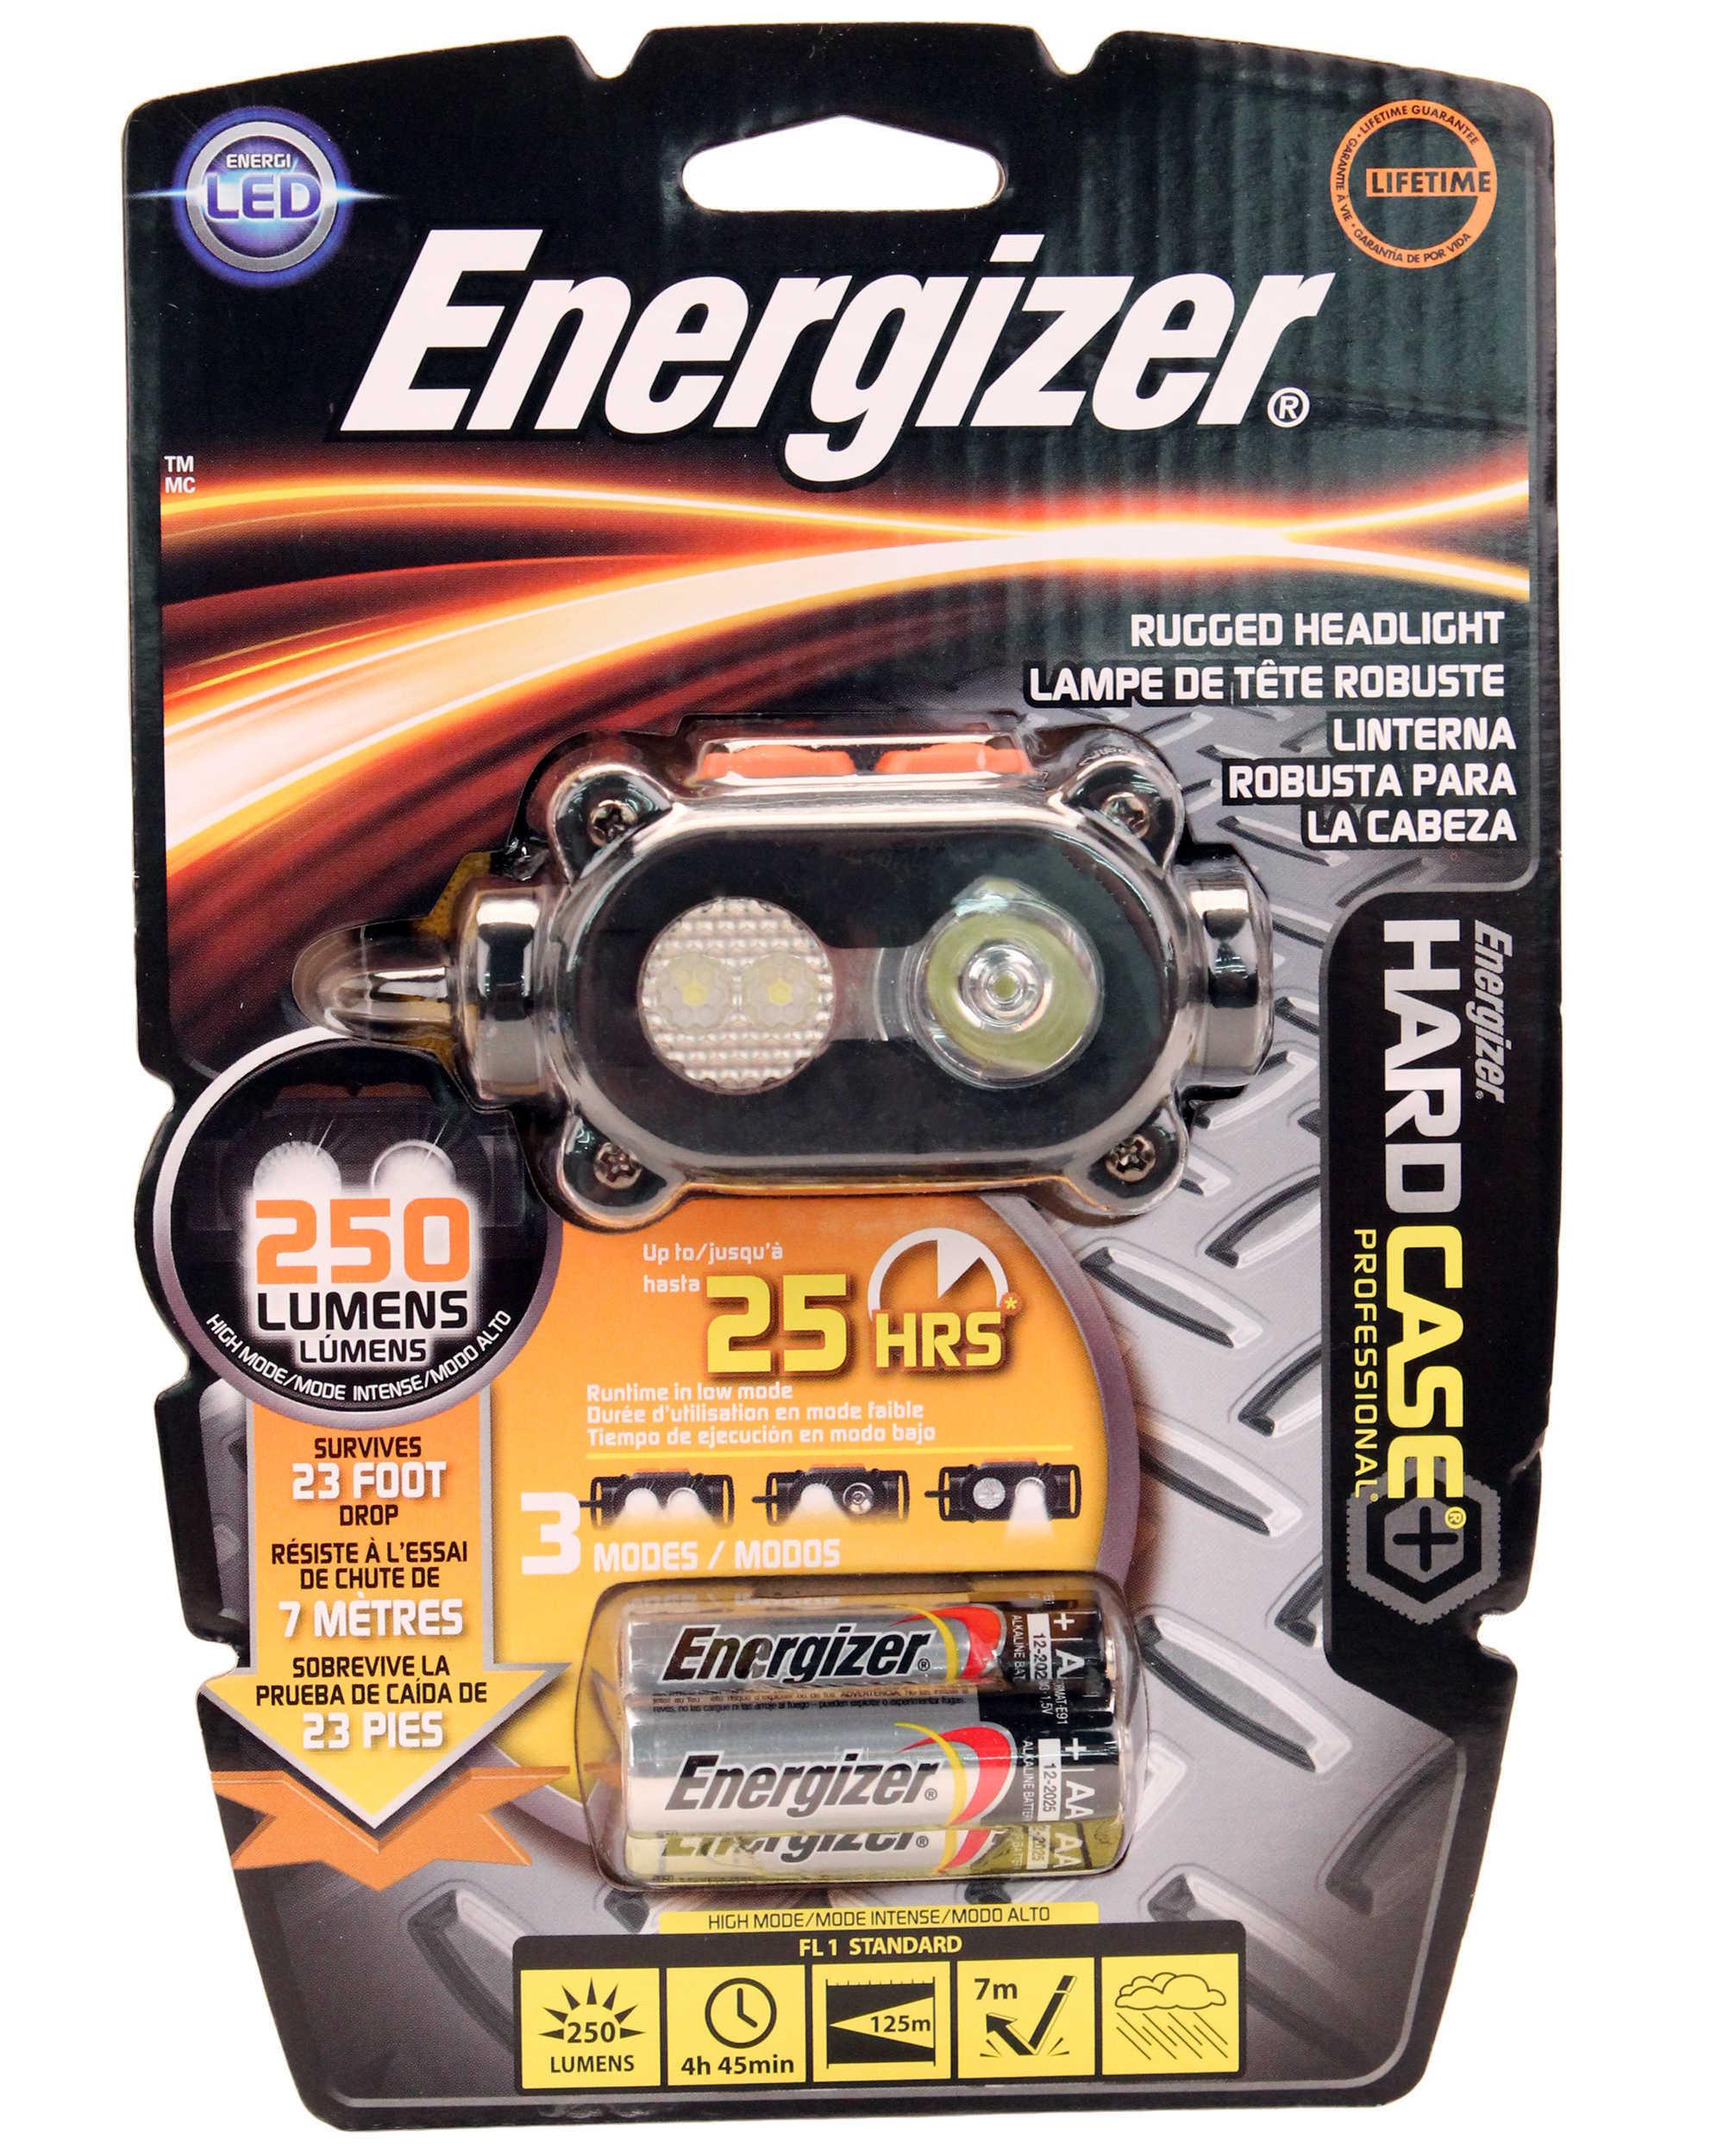 Hard Case Light Pro 4 -Led Headlight Md: TUFHD31Pe